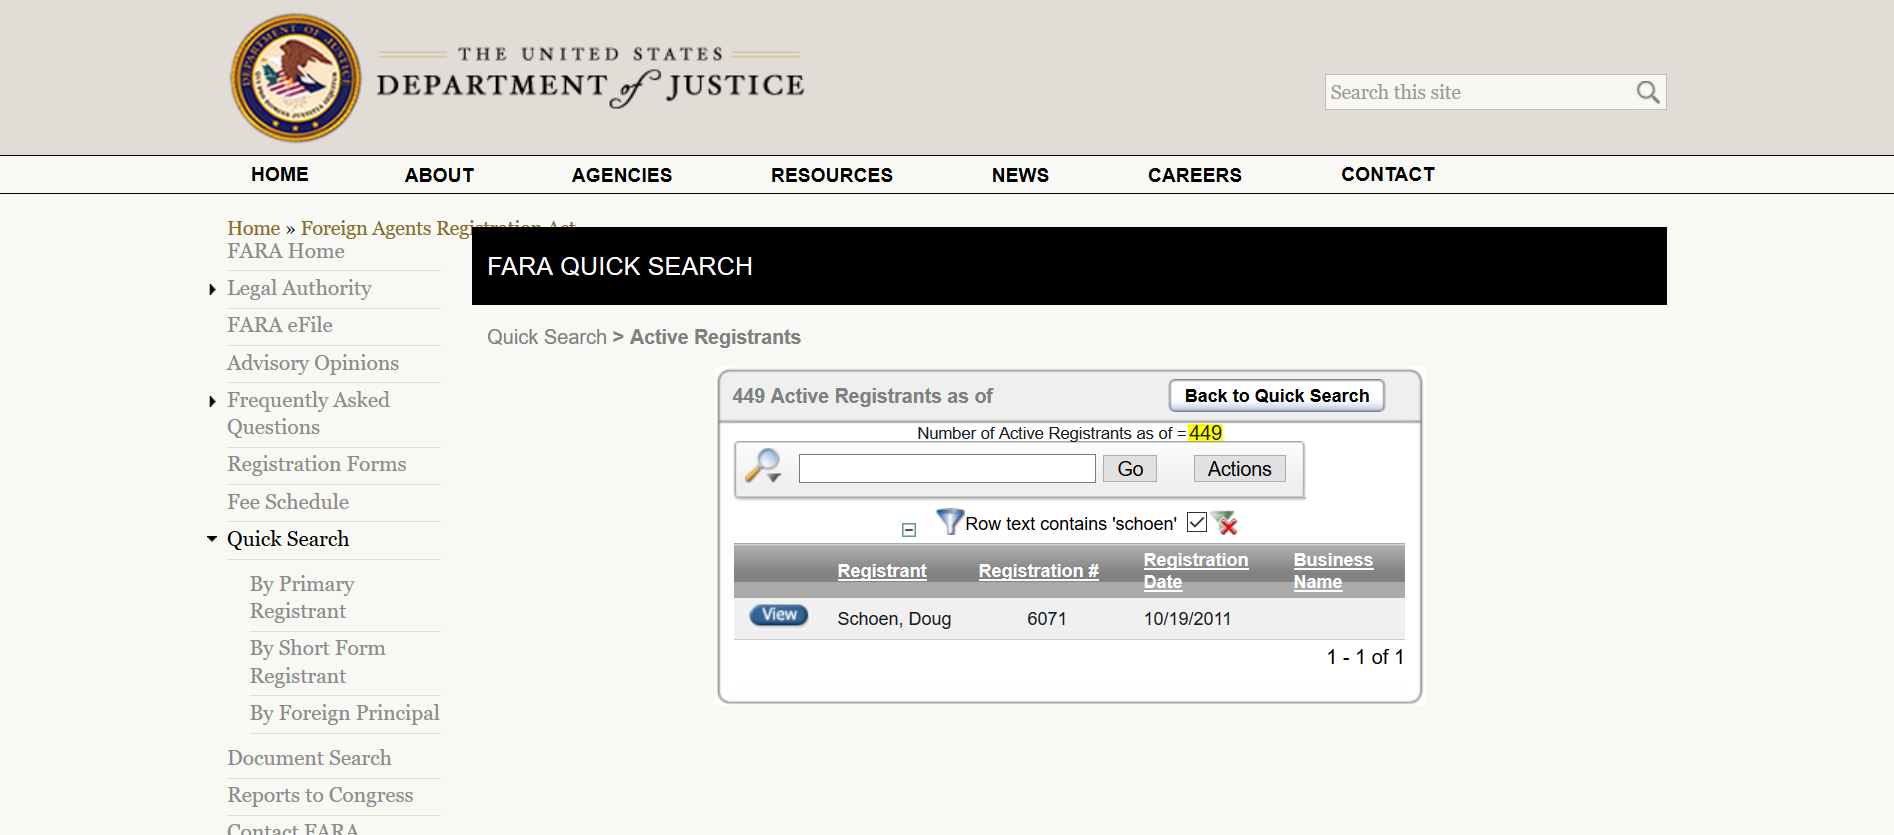 Schoen FARA registration back to 2011.png